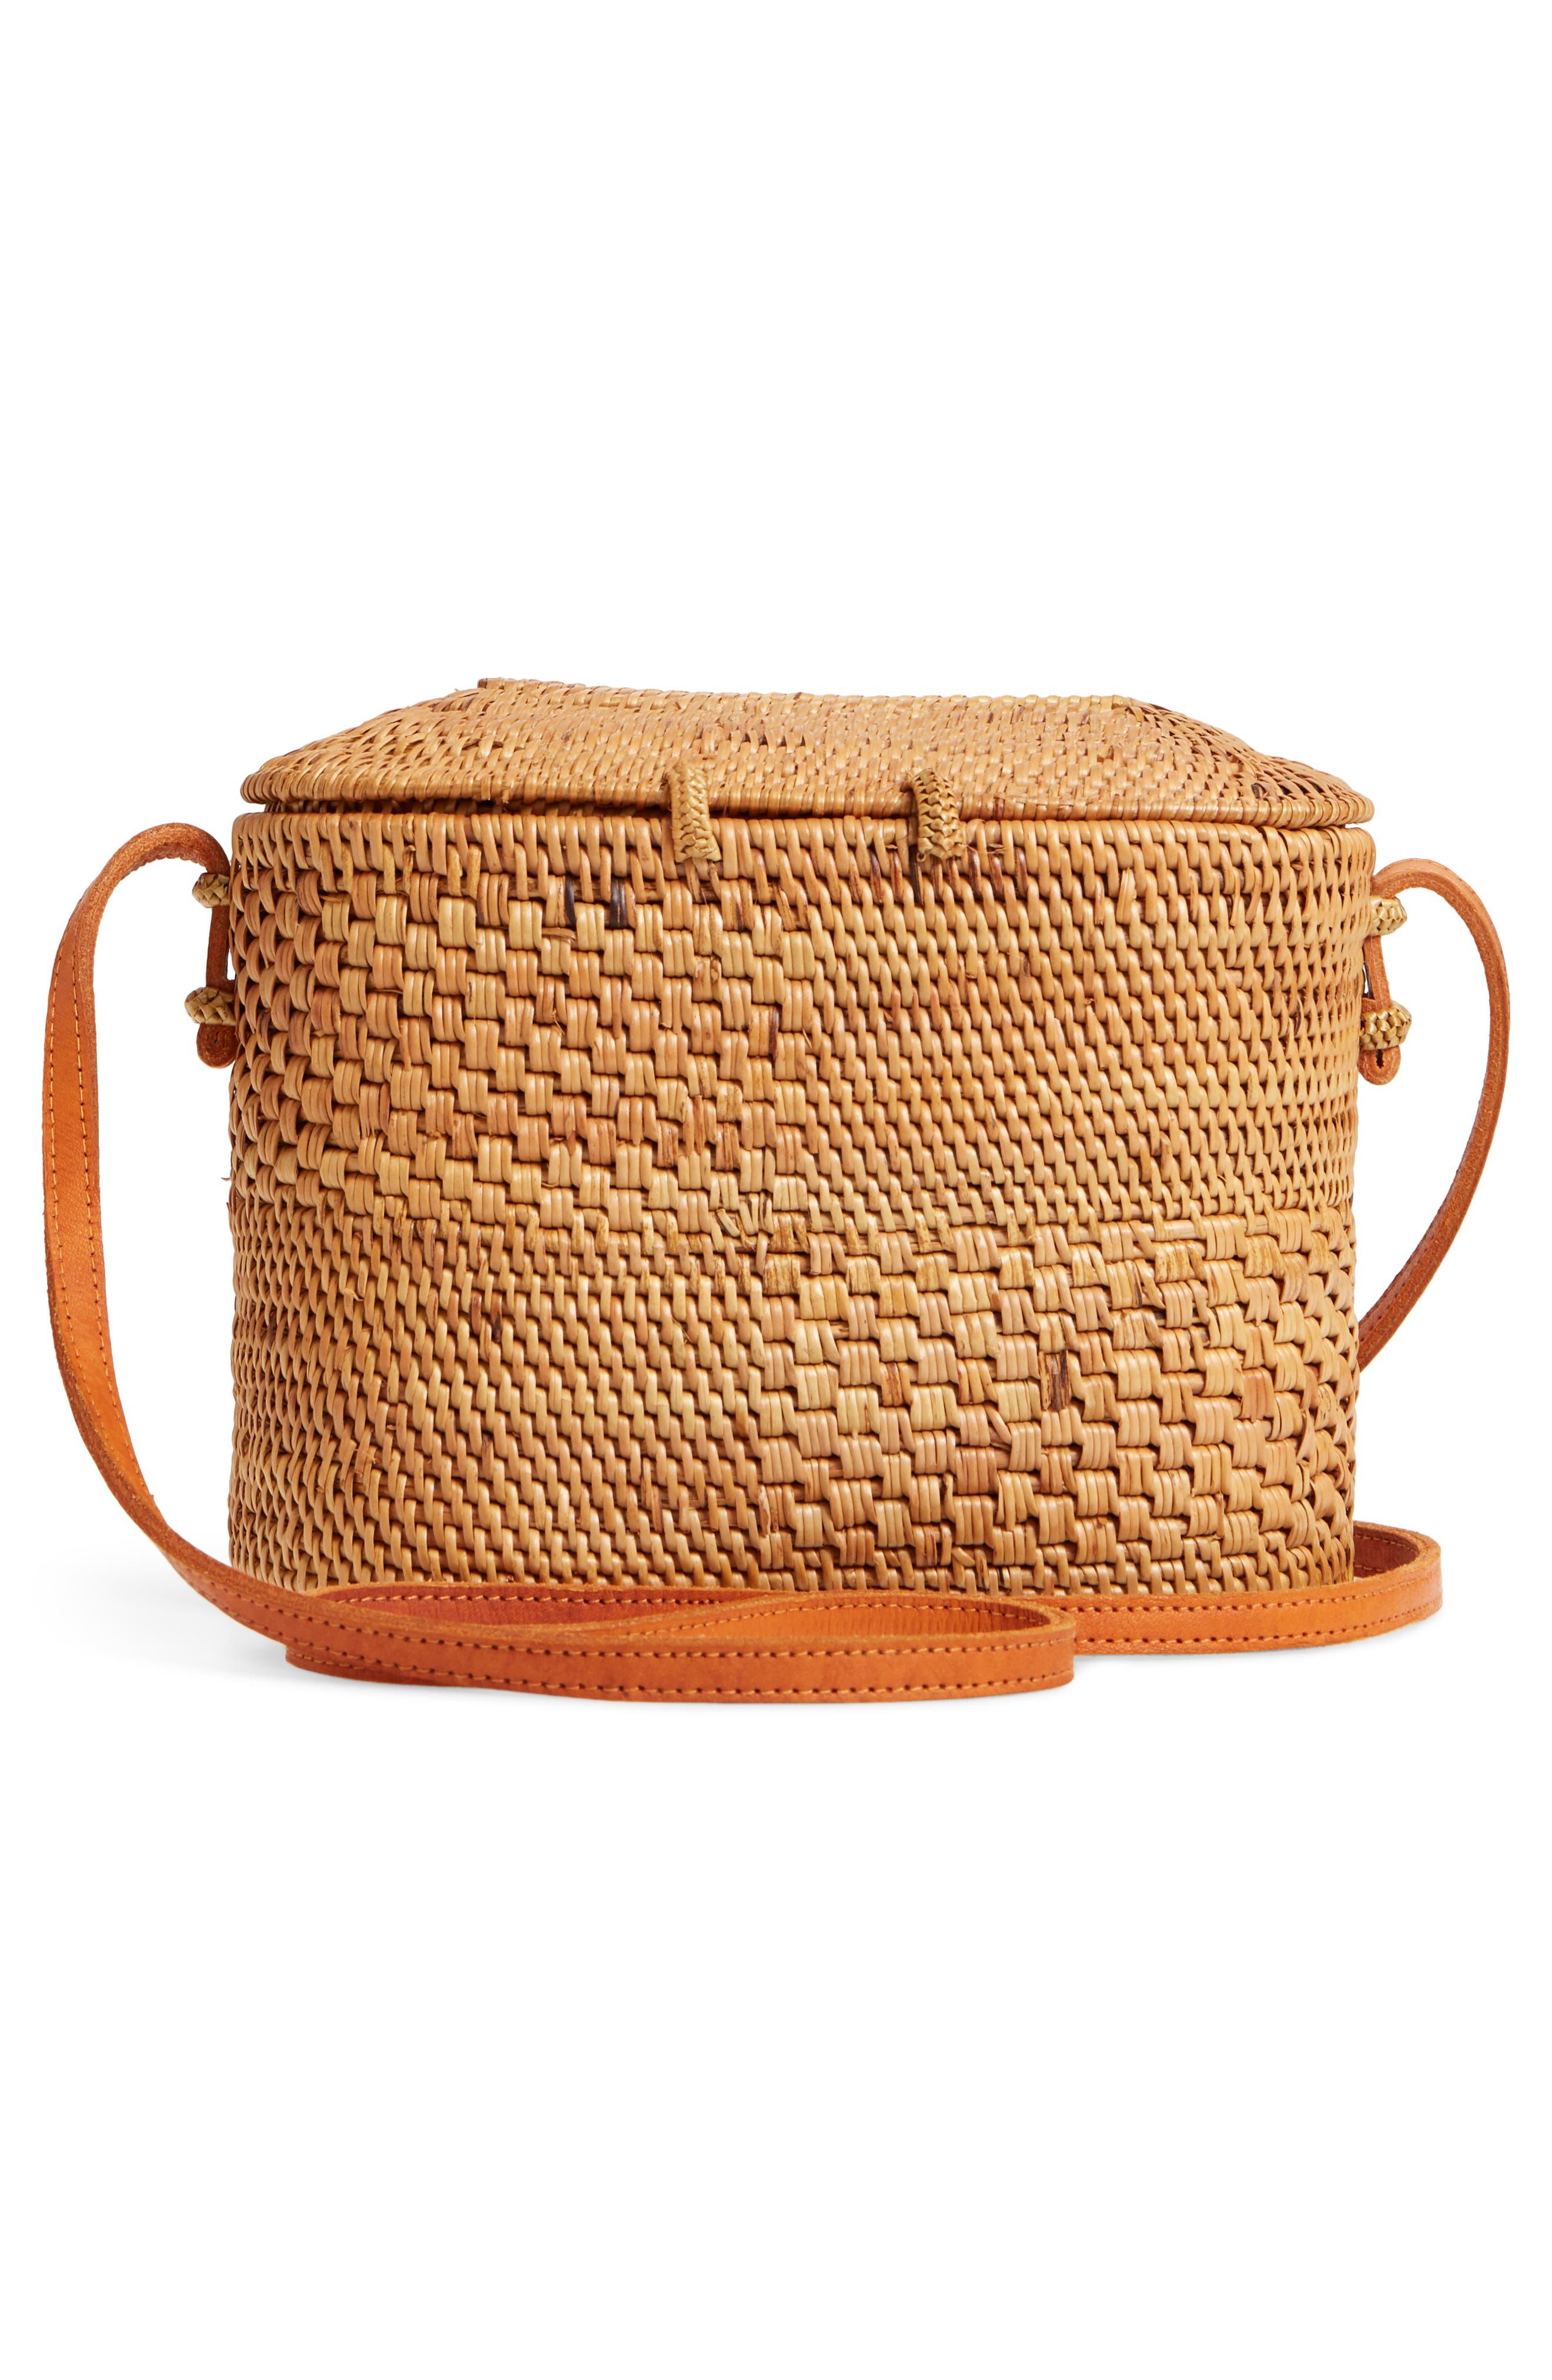 Woven Rattan Box Crossbody Bag,                             Alternate thumbnail 3, color,                             Tan